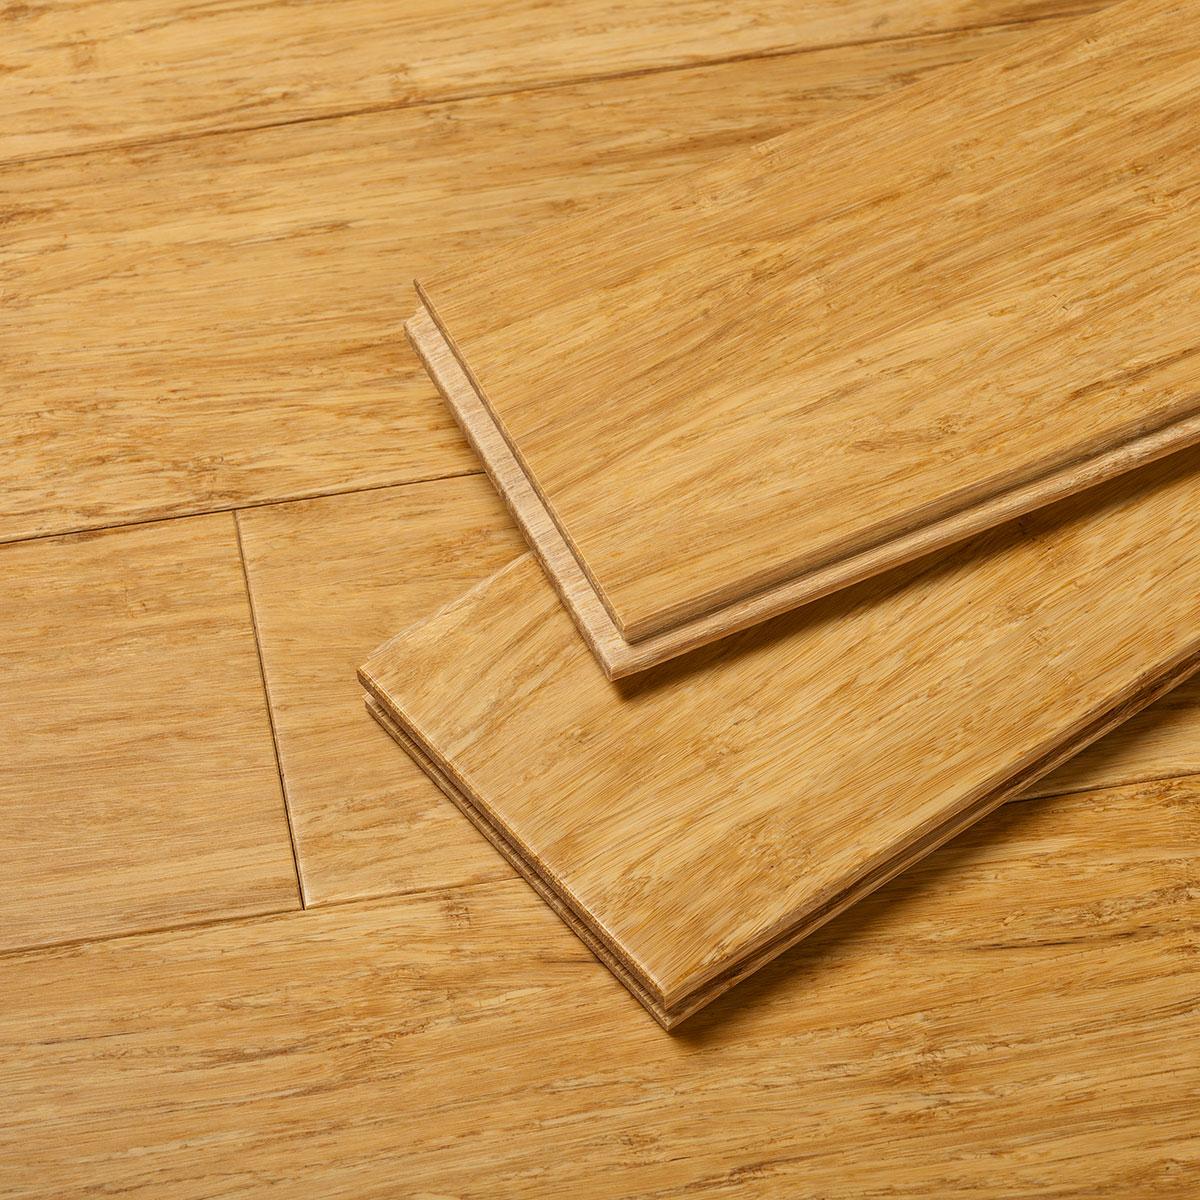 Bamboo Flooring Noise: Plyboo Free Bamboo Flooring Sample